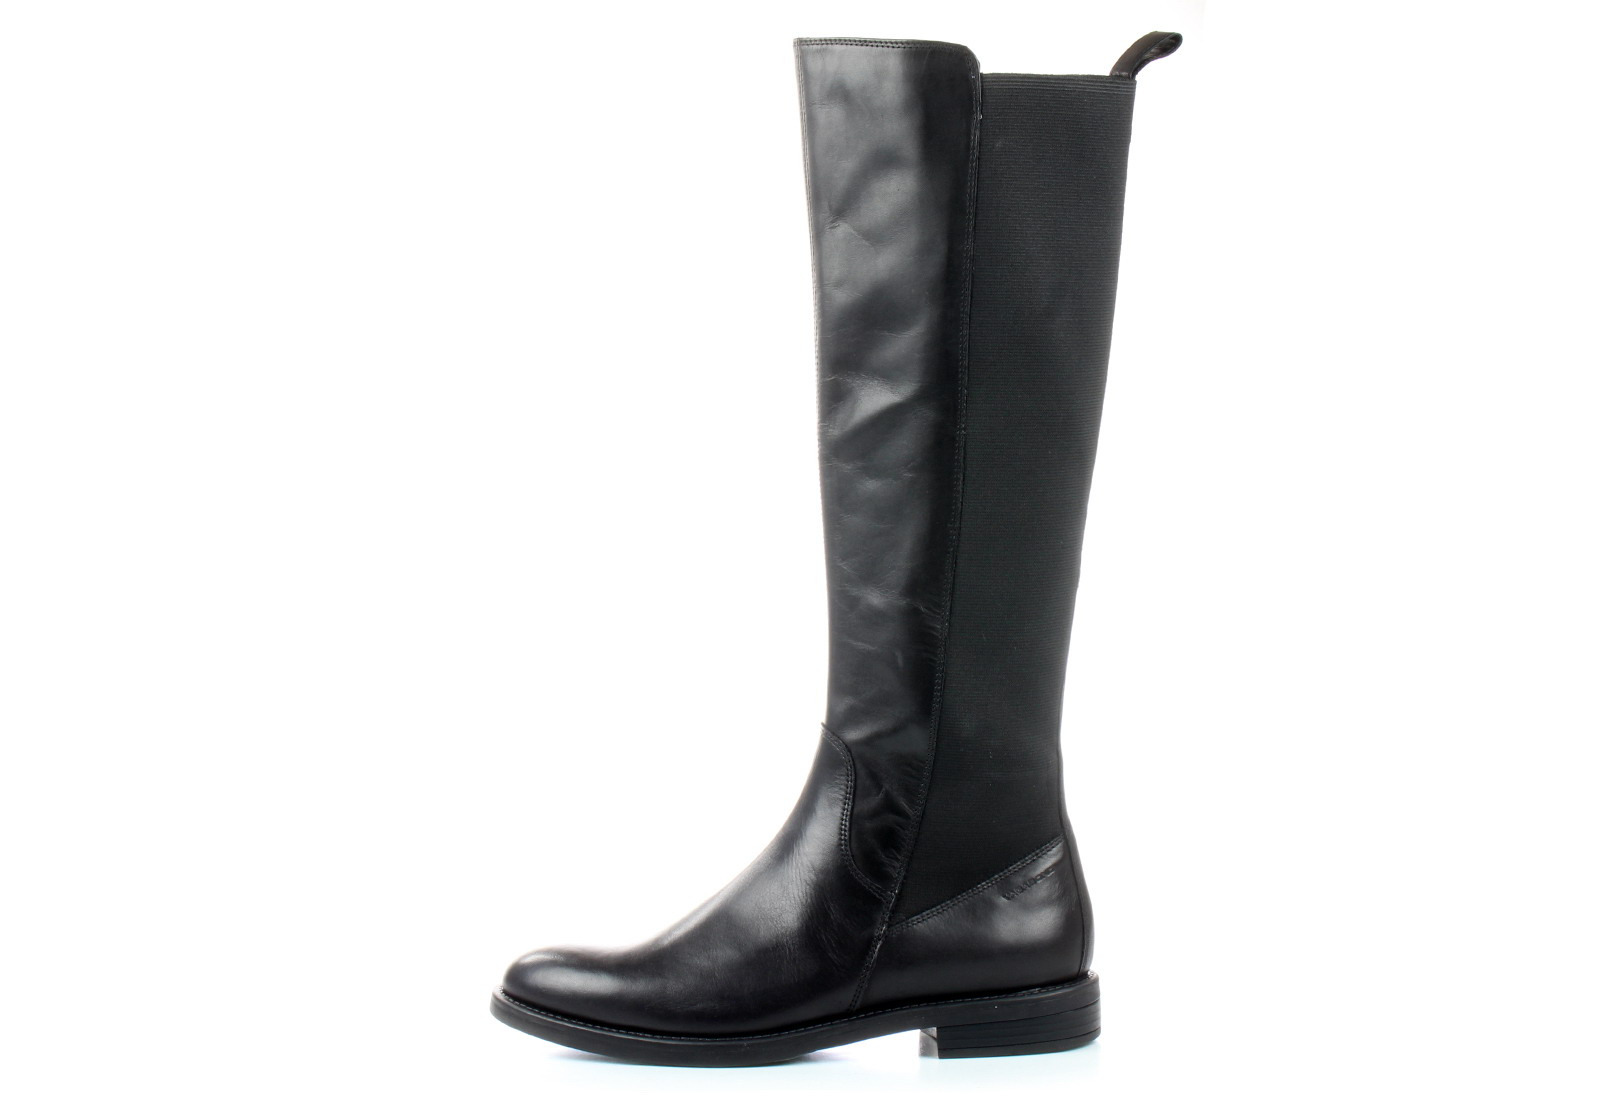 Vagabond Boots - Amina - 4203-301-20 - Online shop for sneakers ... ed6b9e209e